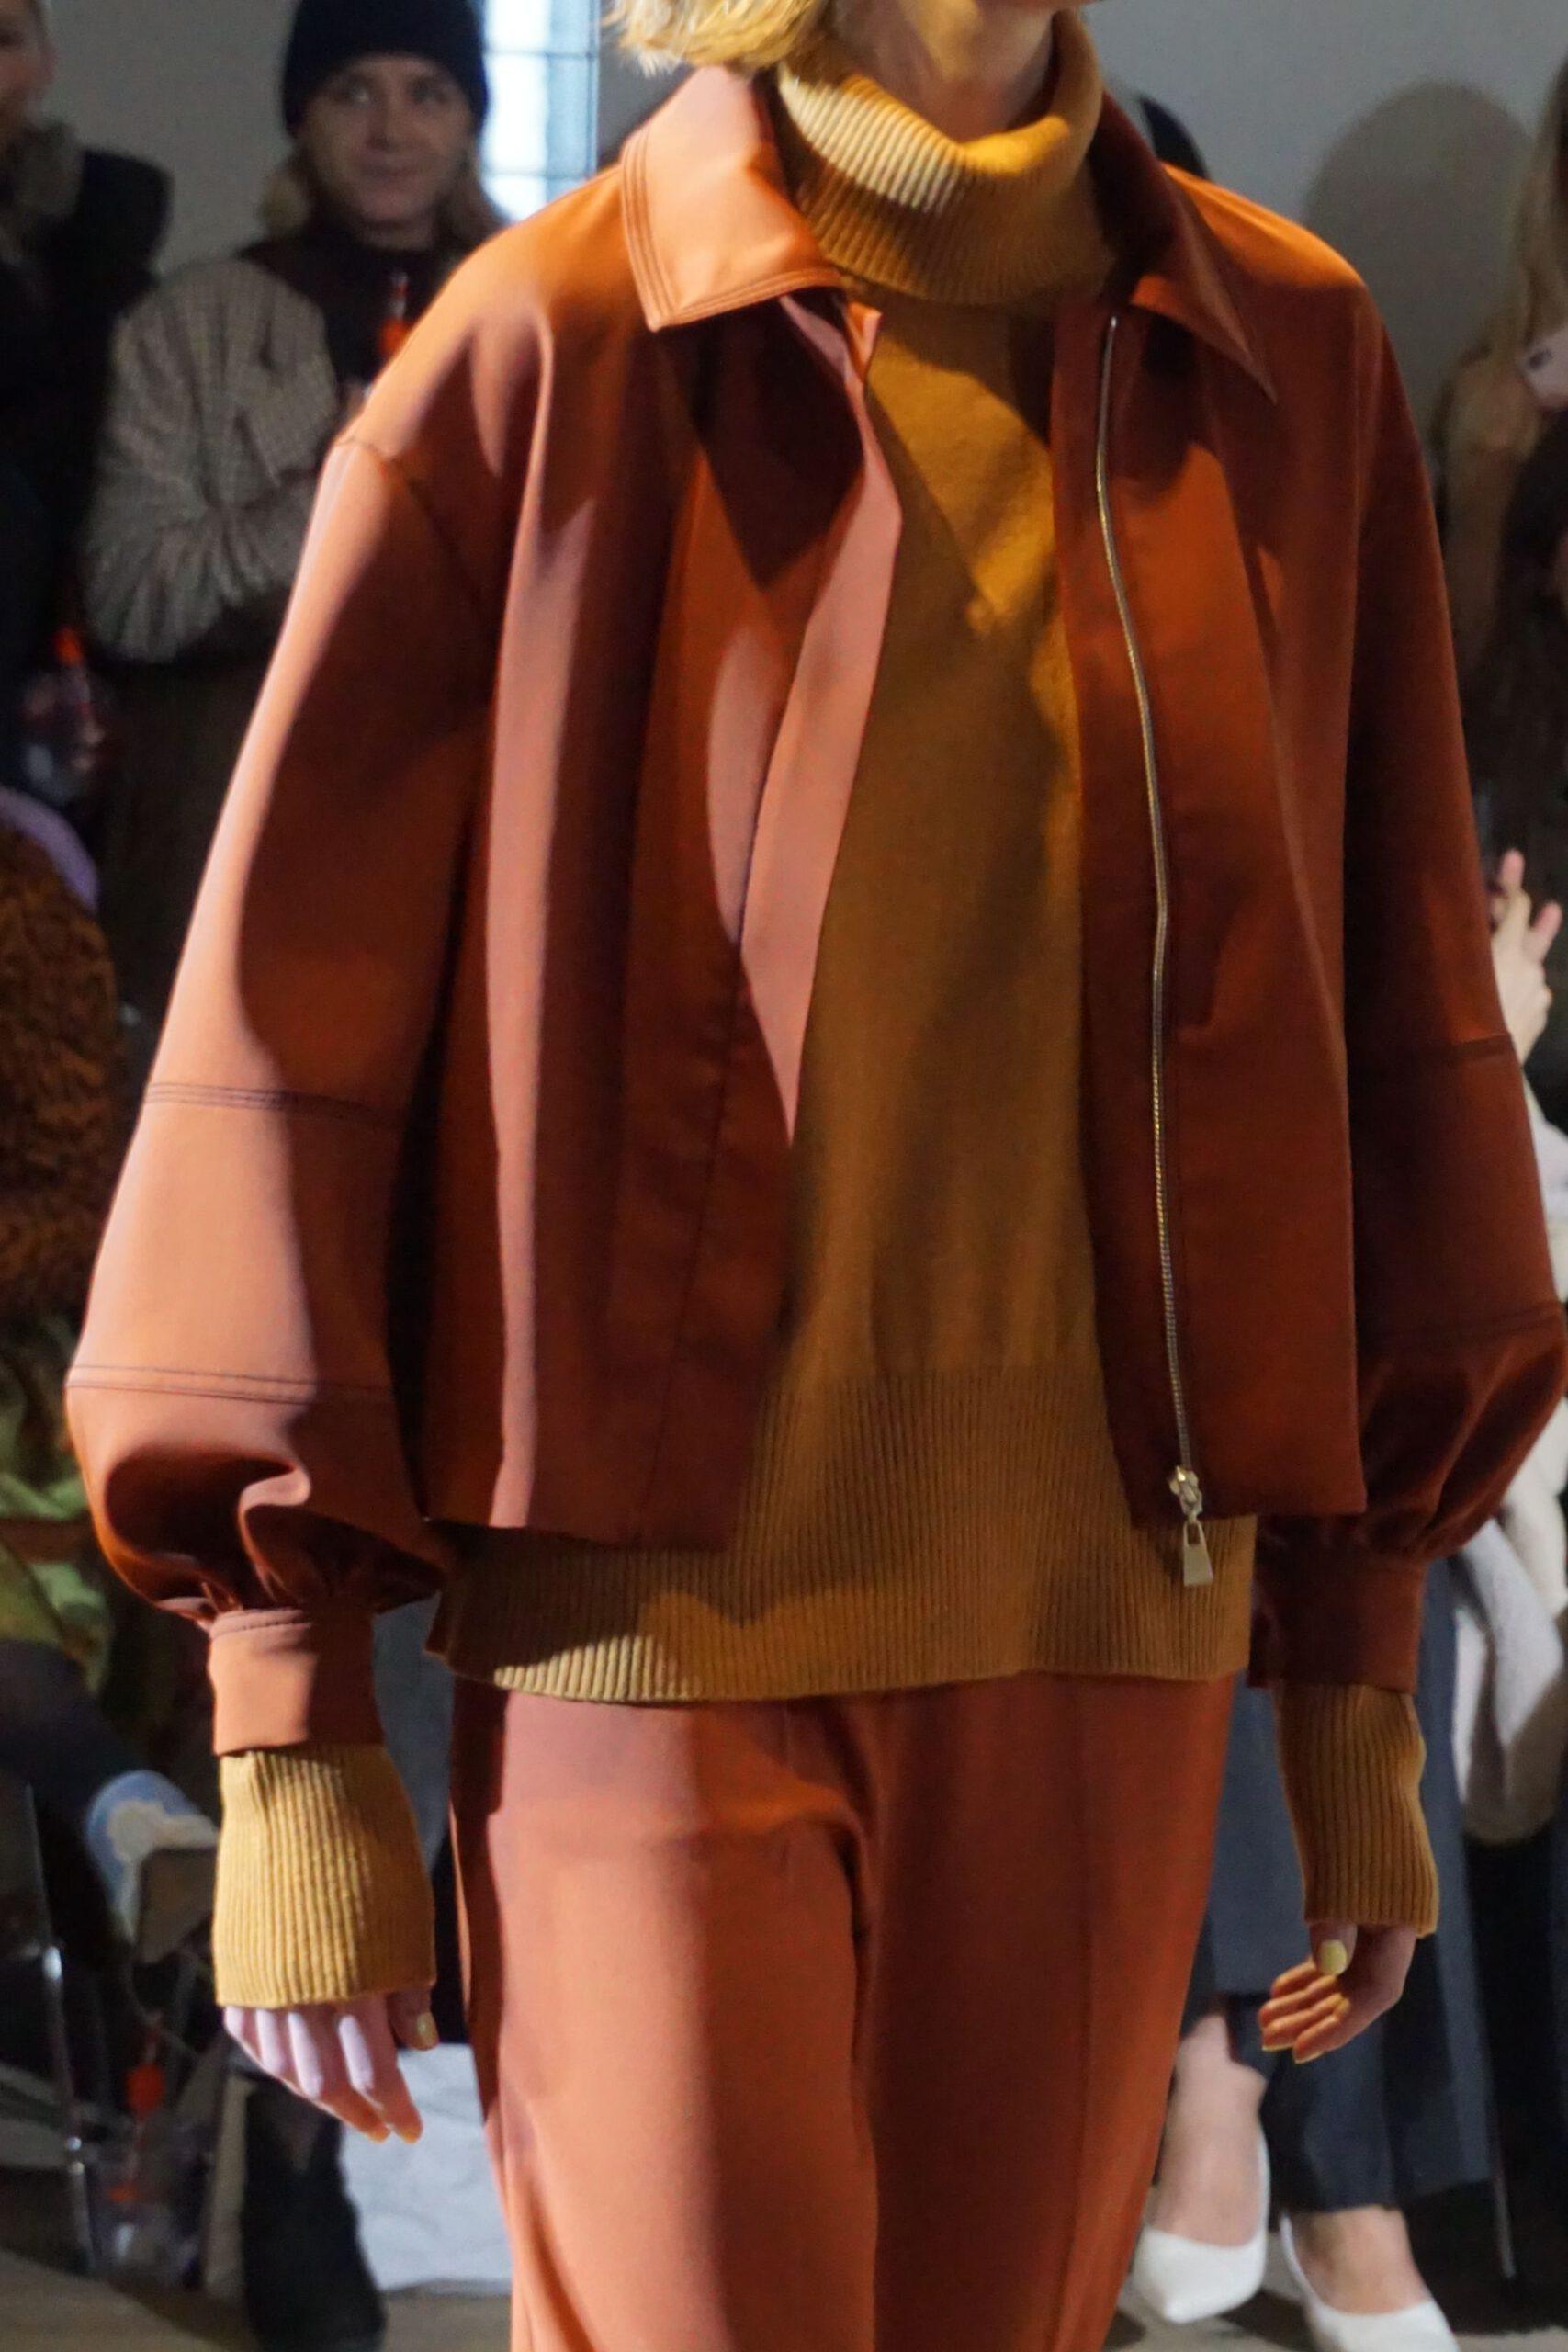 blanche copenhagen fashion show 16